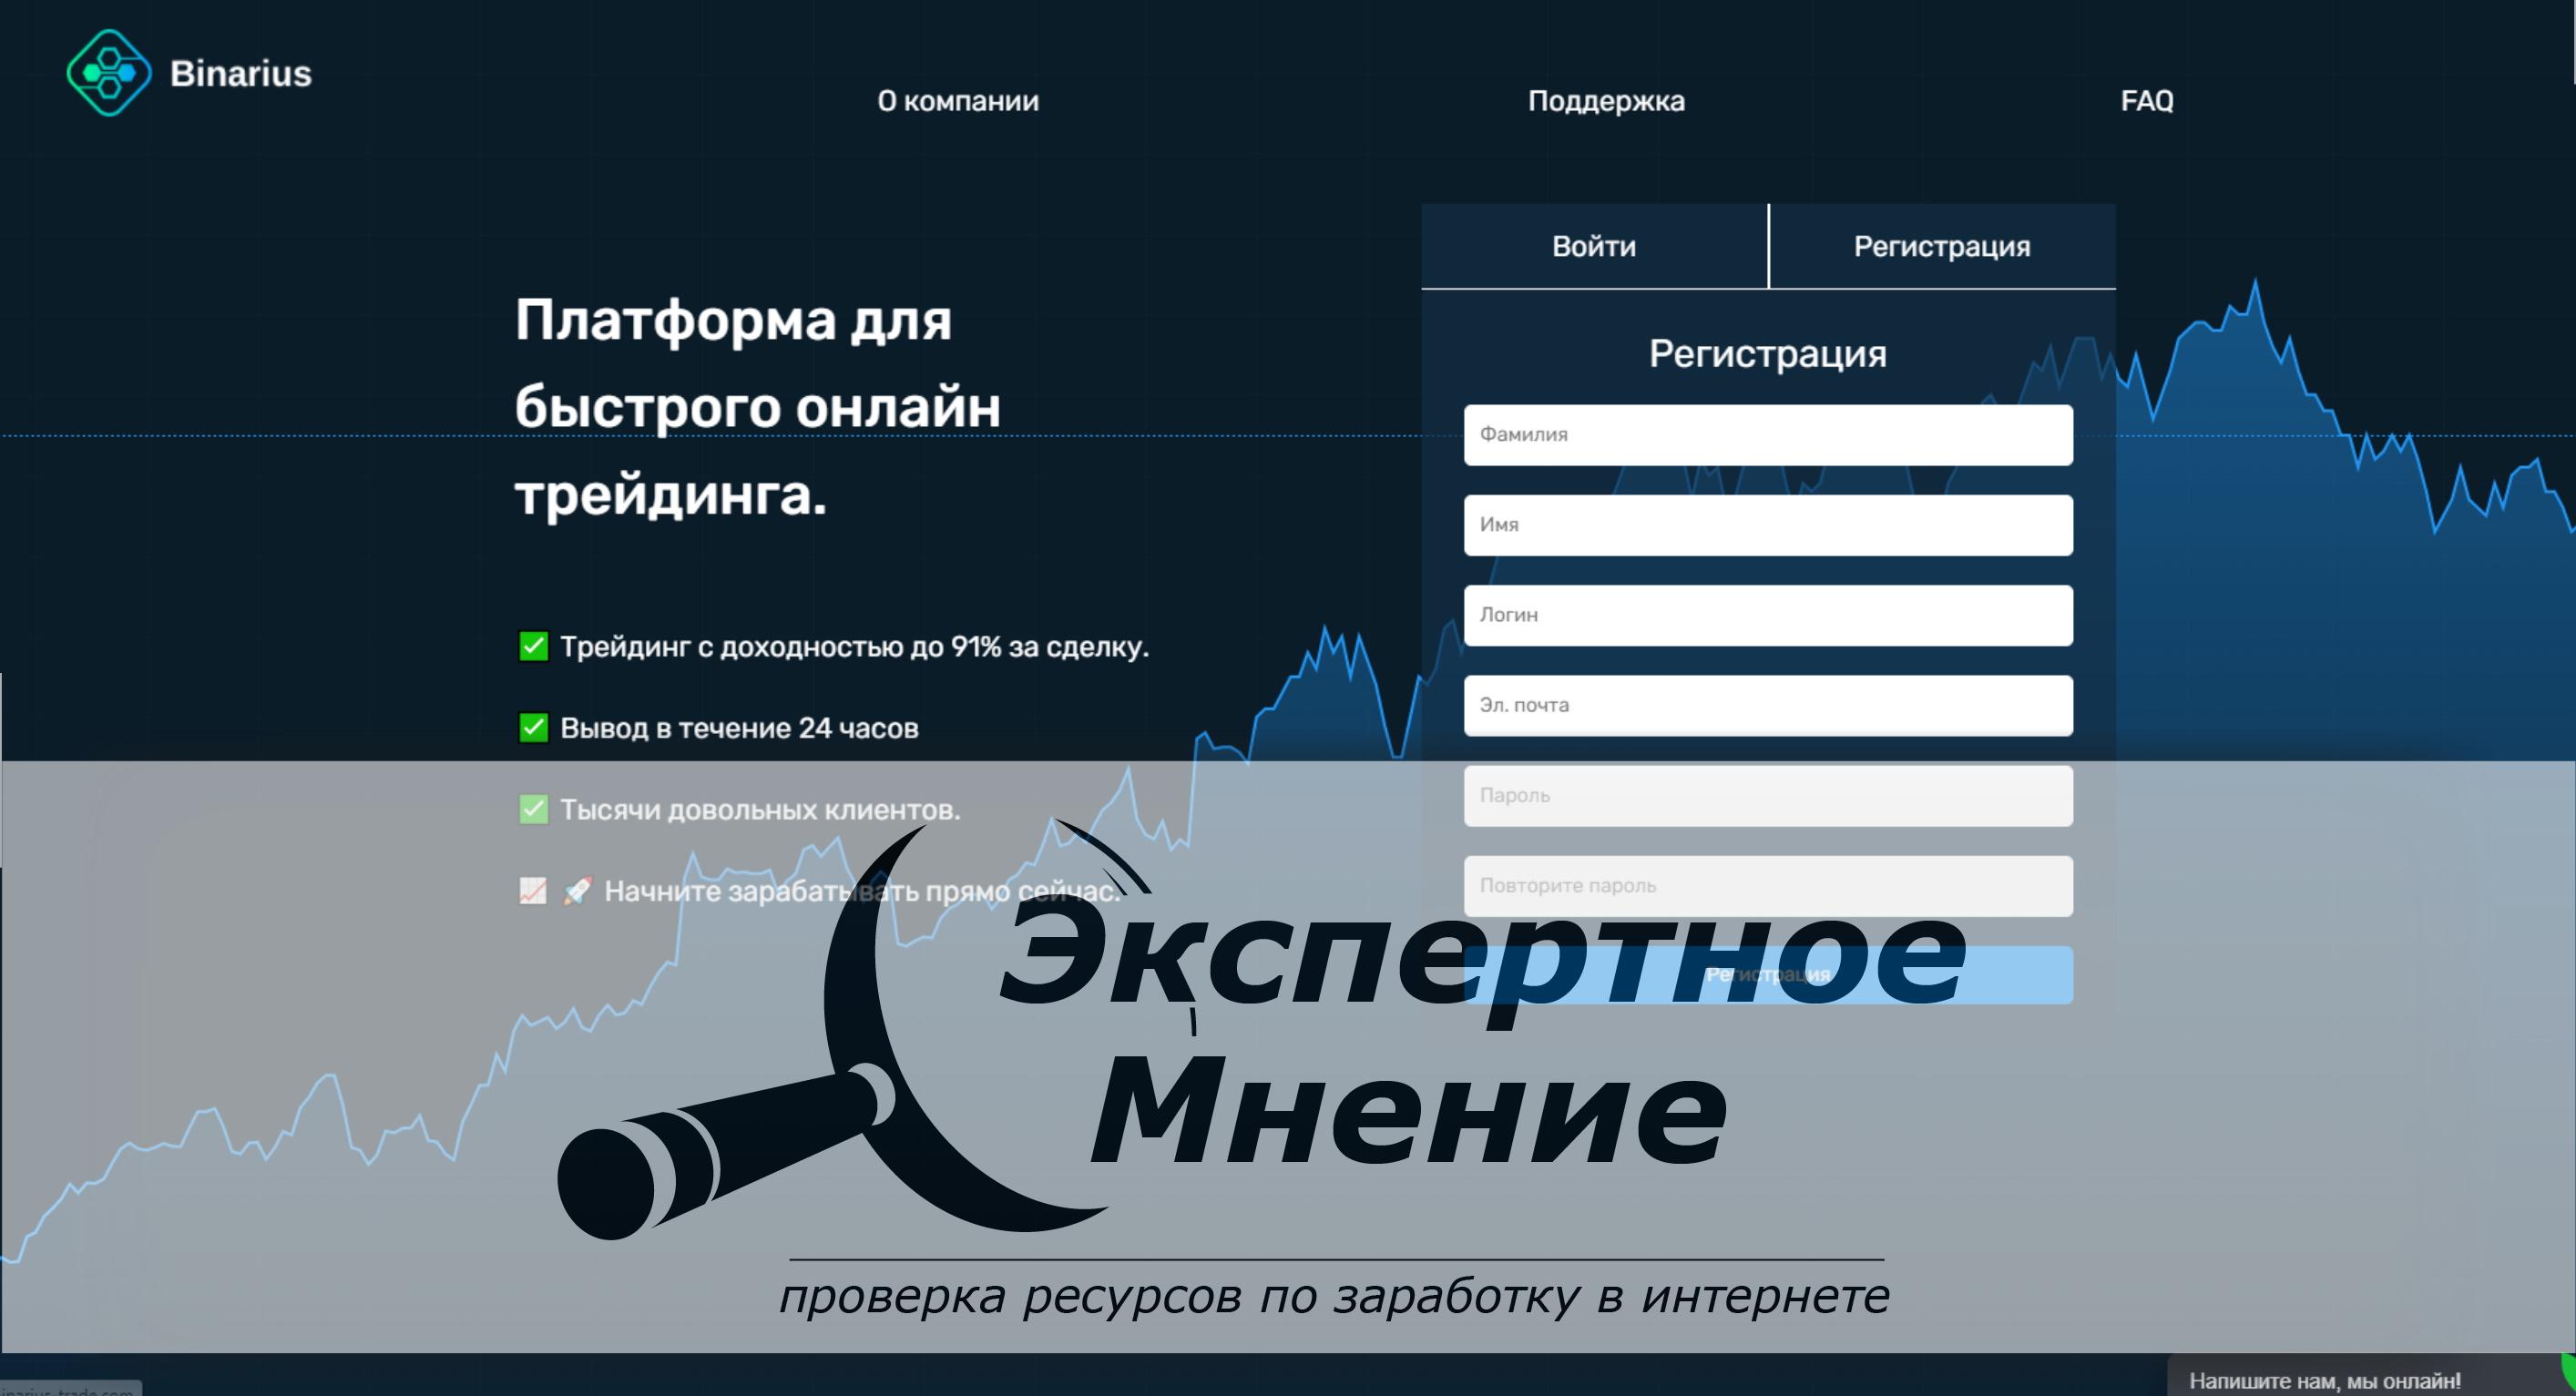 Binarius Trade Платформа для быстрого онлайн трейдинга отзывы